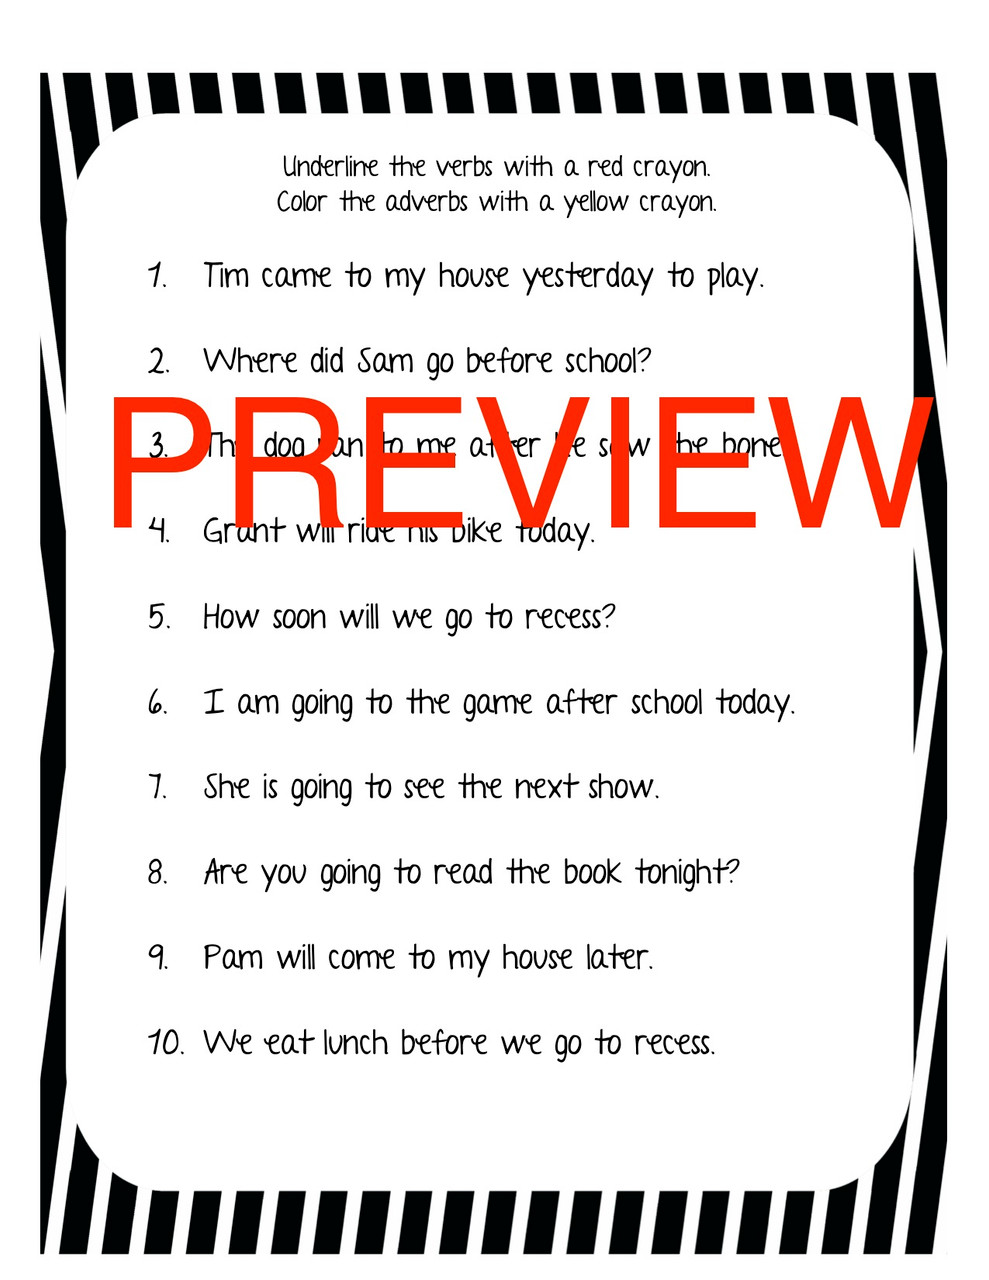 Adverb vs Verb